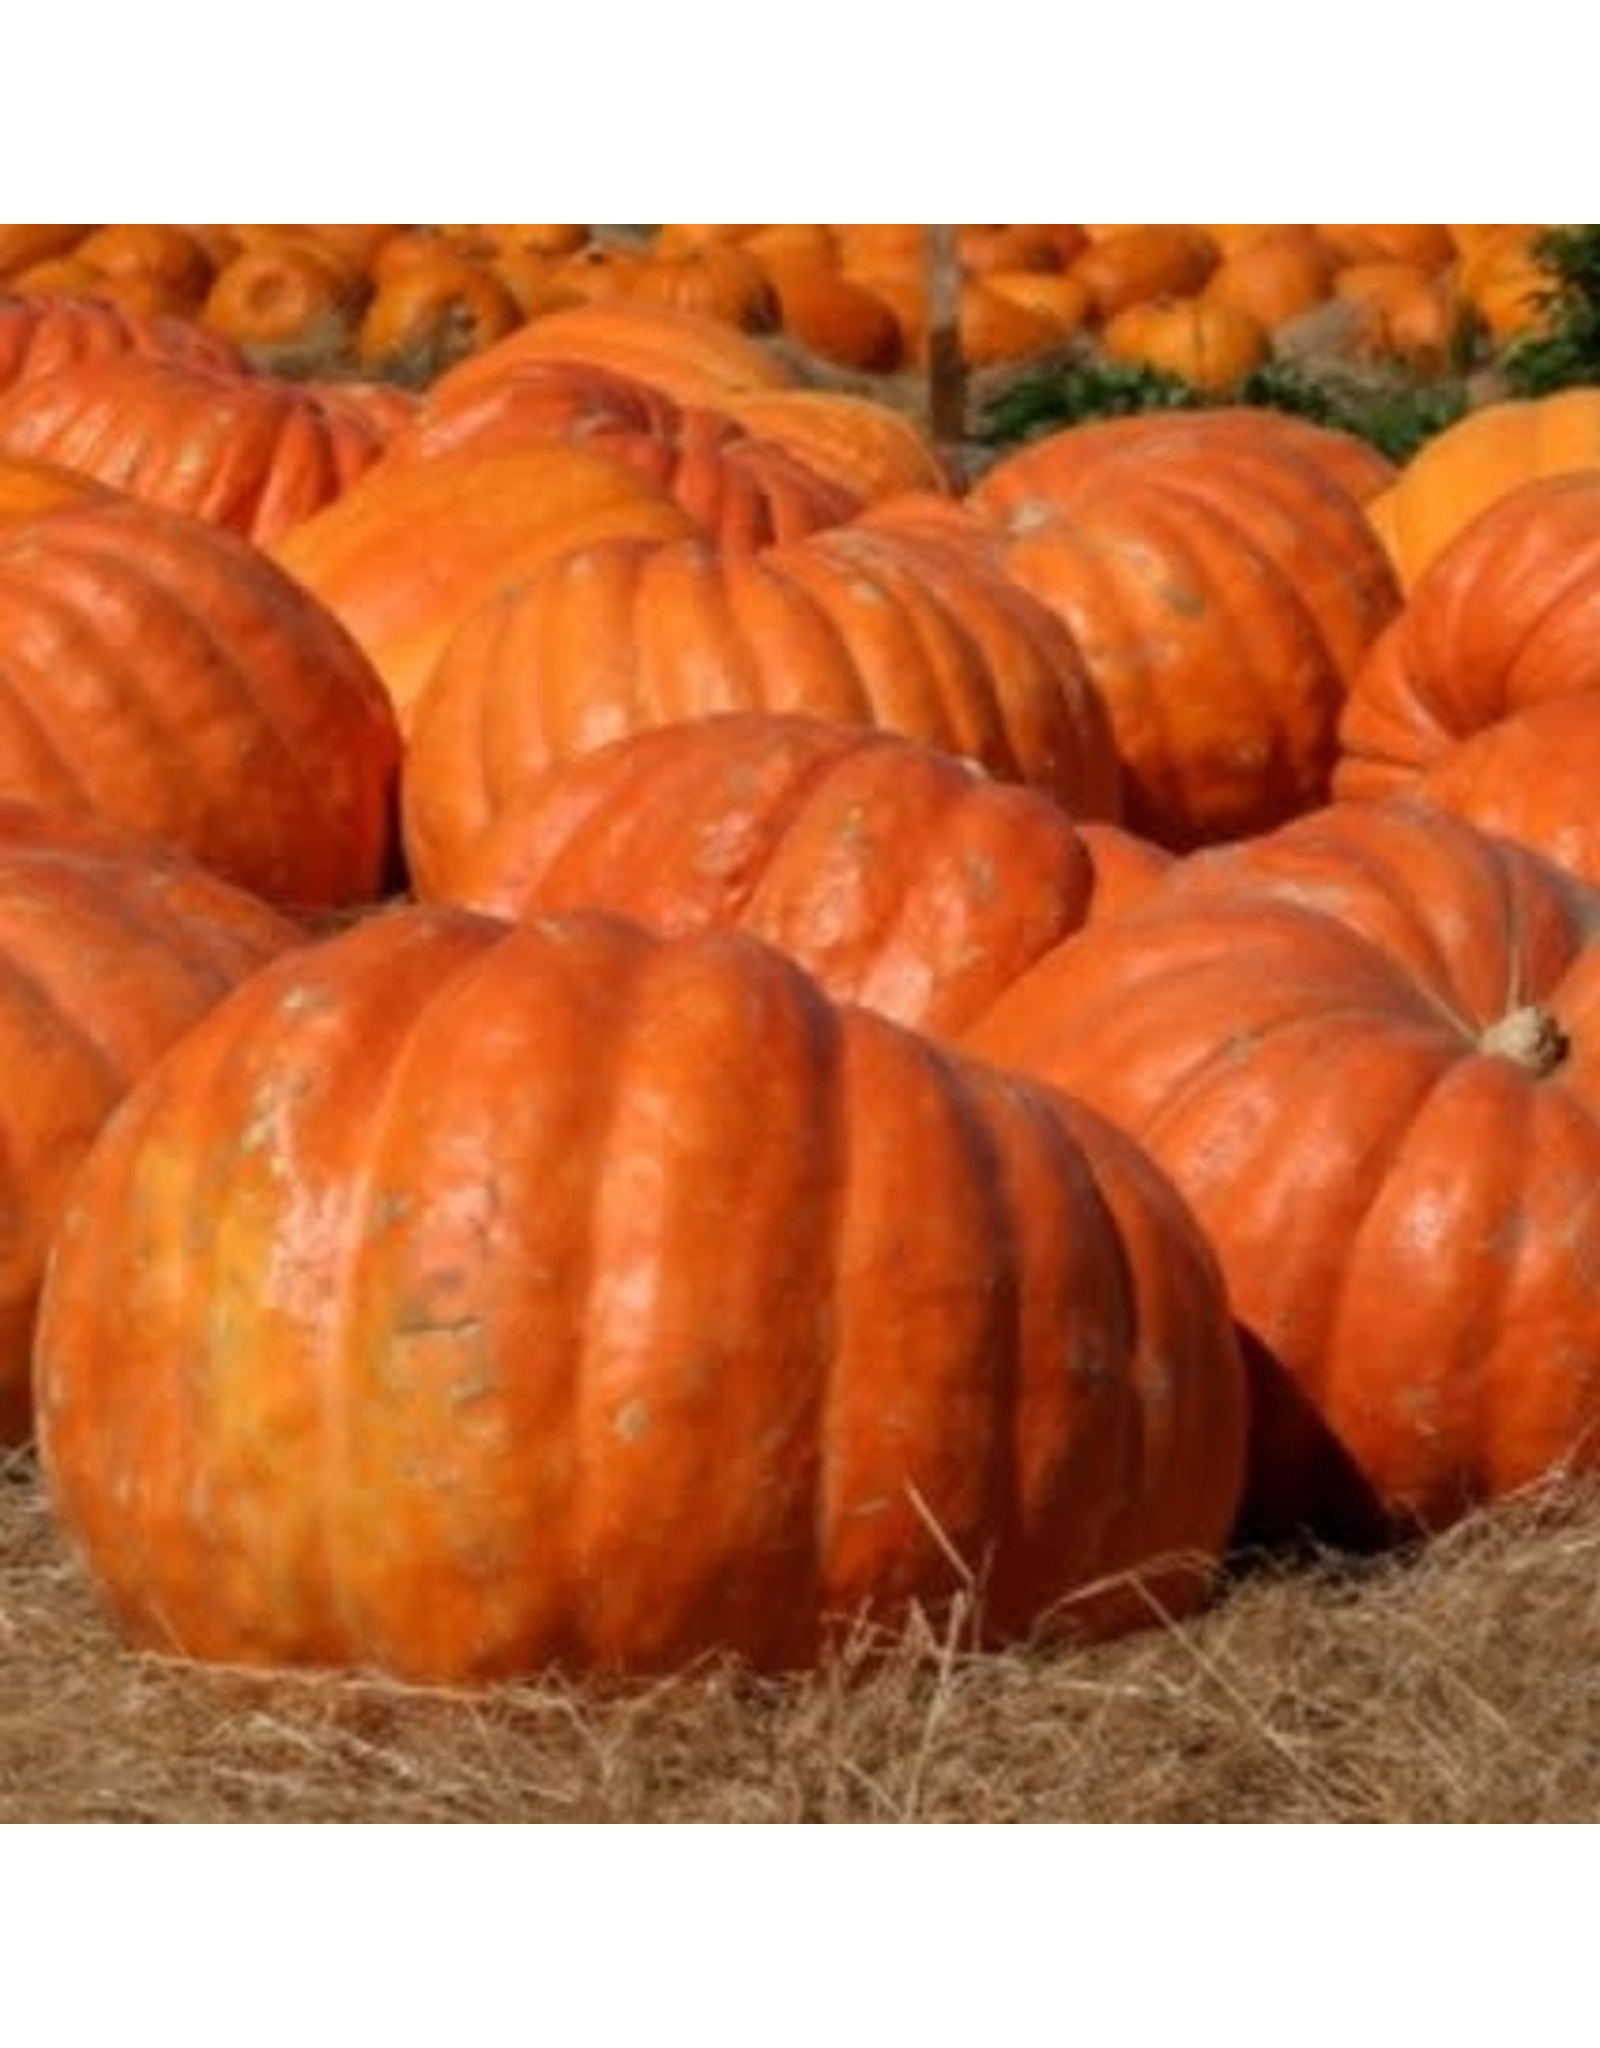 Dill's Atlantic Giant Pumpkin Seeds 2015